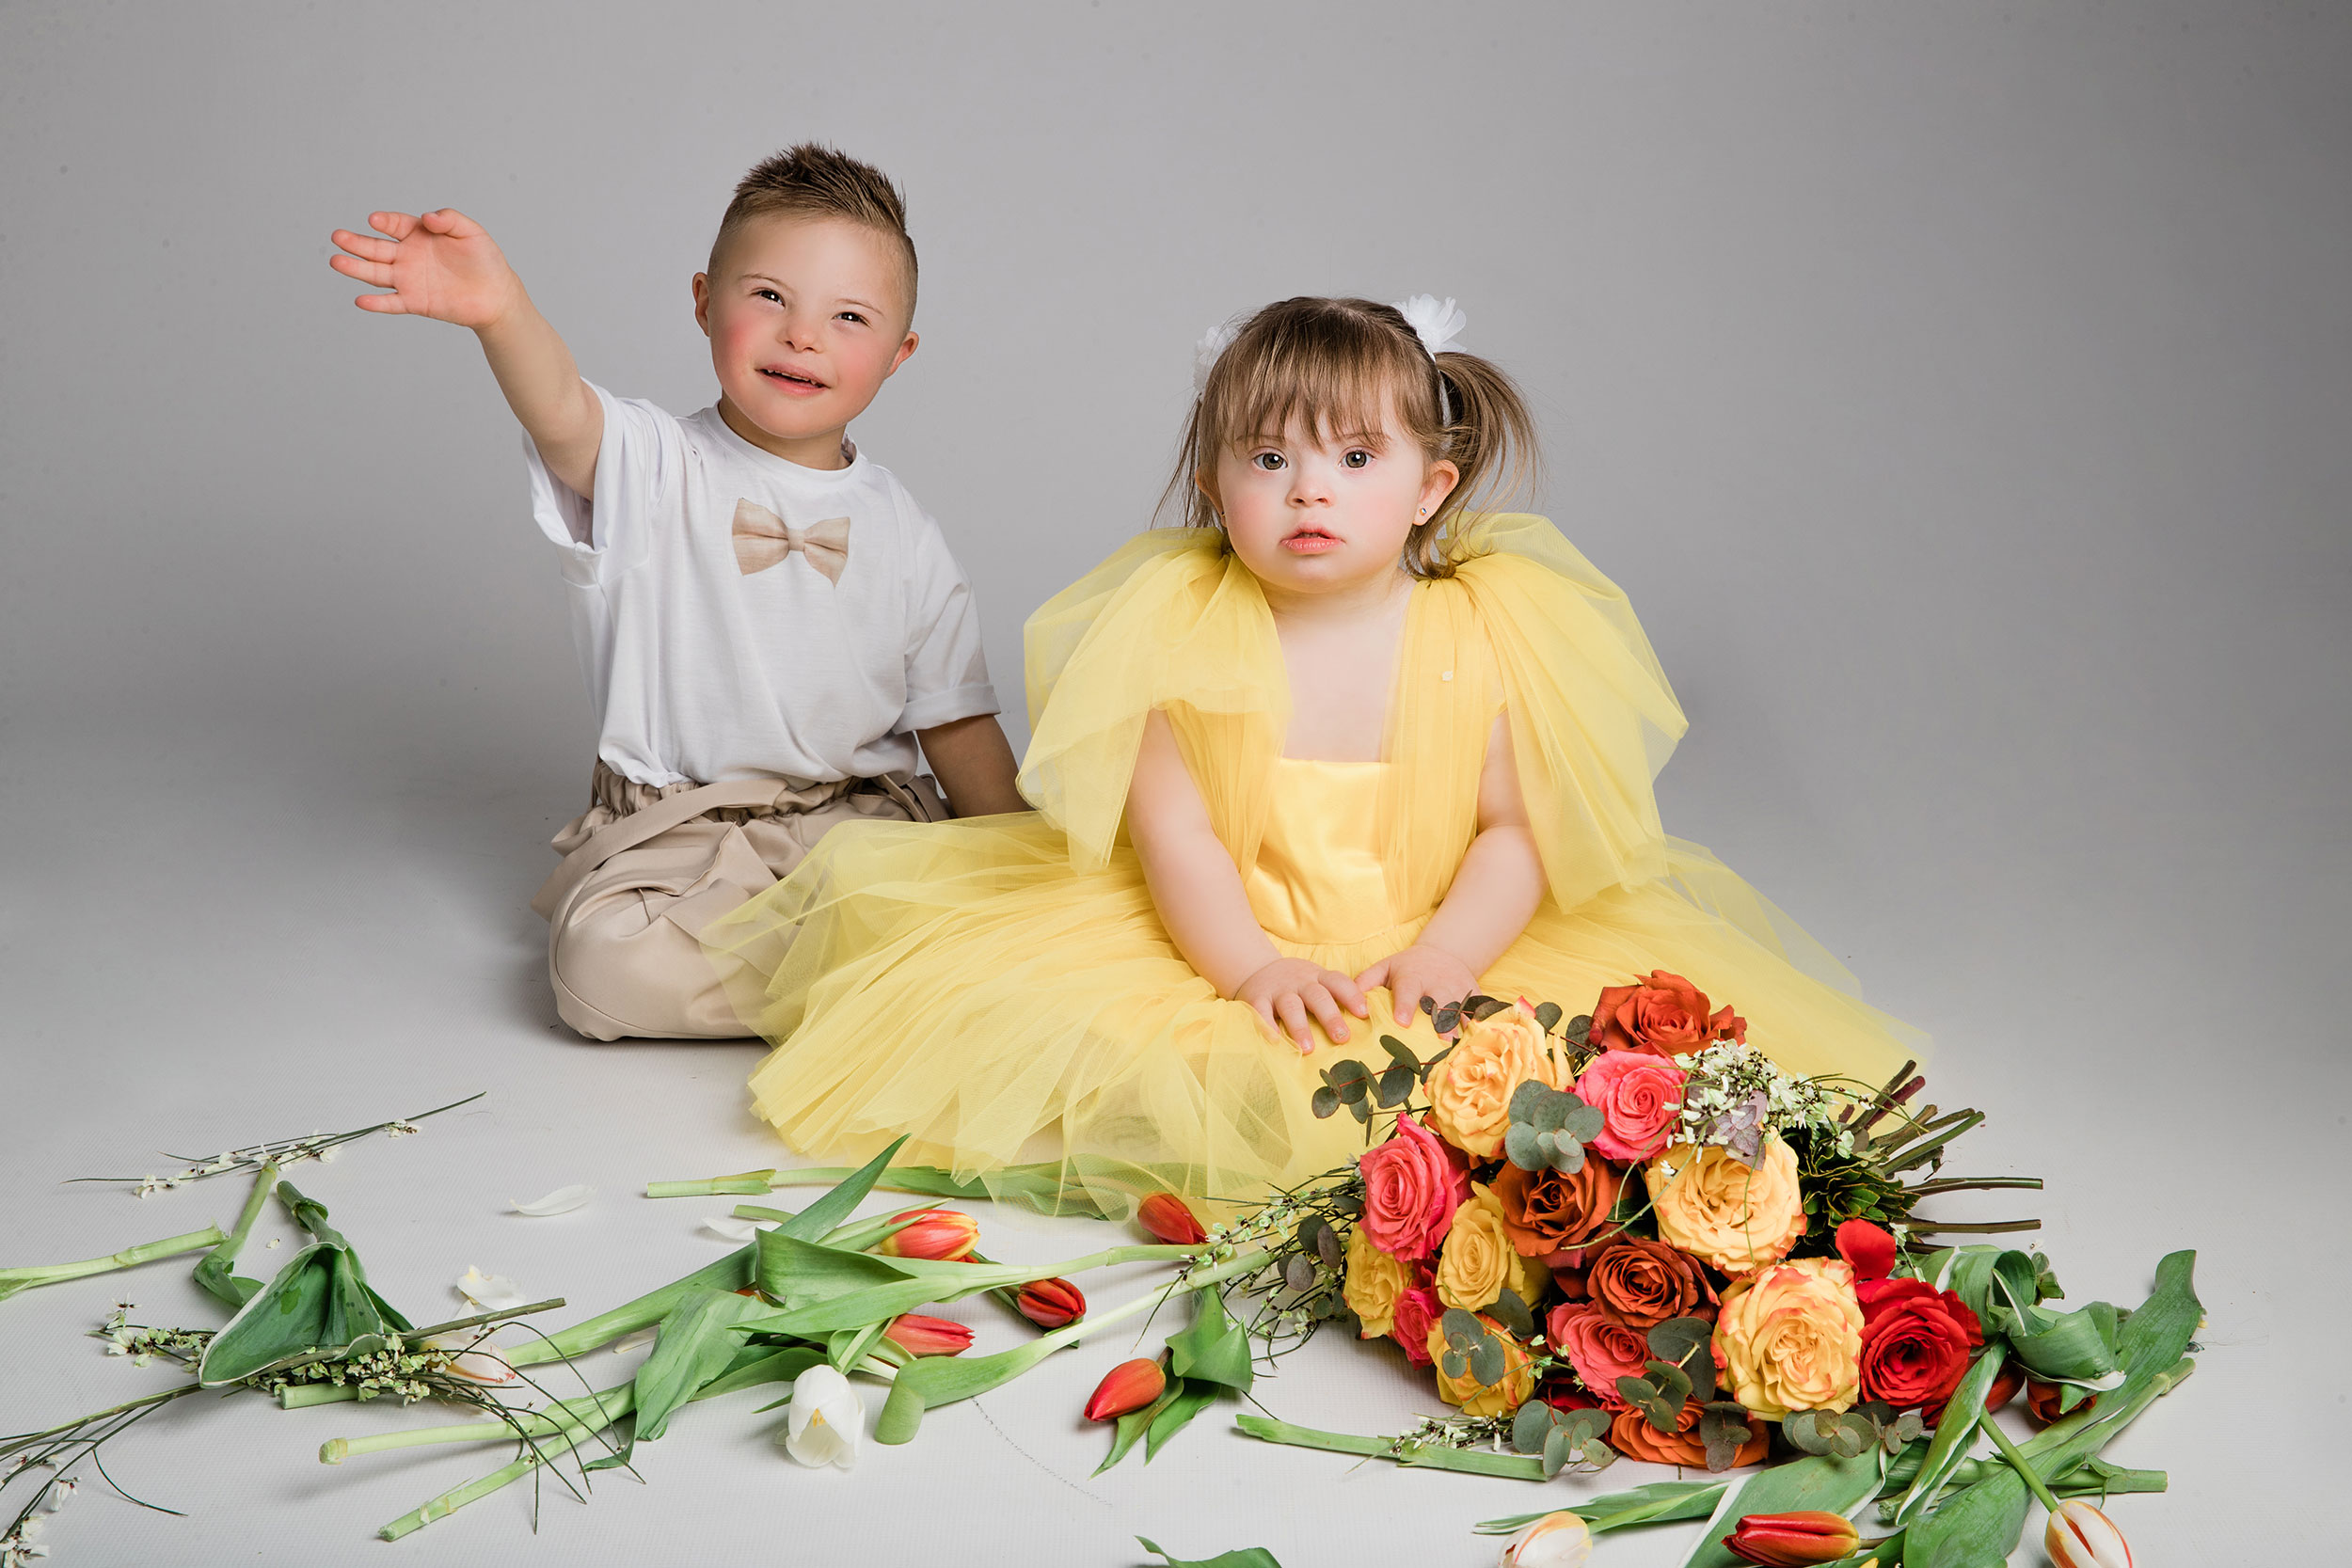 Down Syndrome Kids studio portrait photo